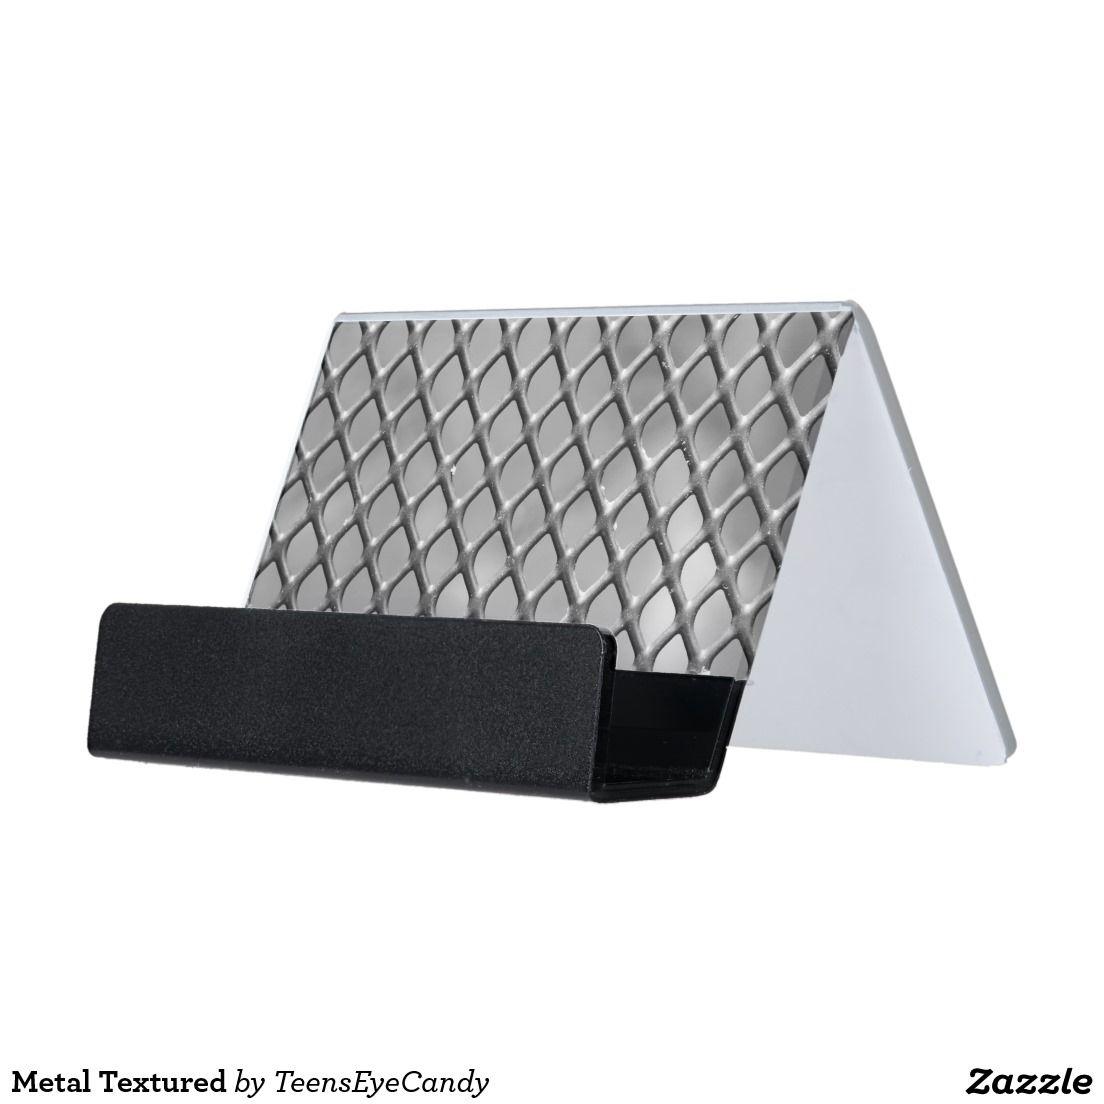 metal textured desk business card holder  zazzle